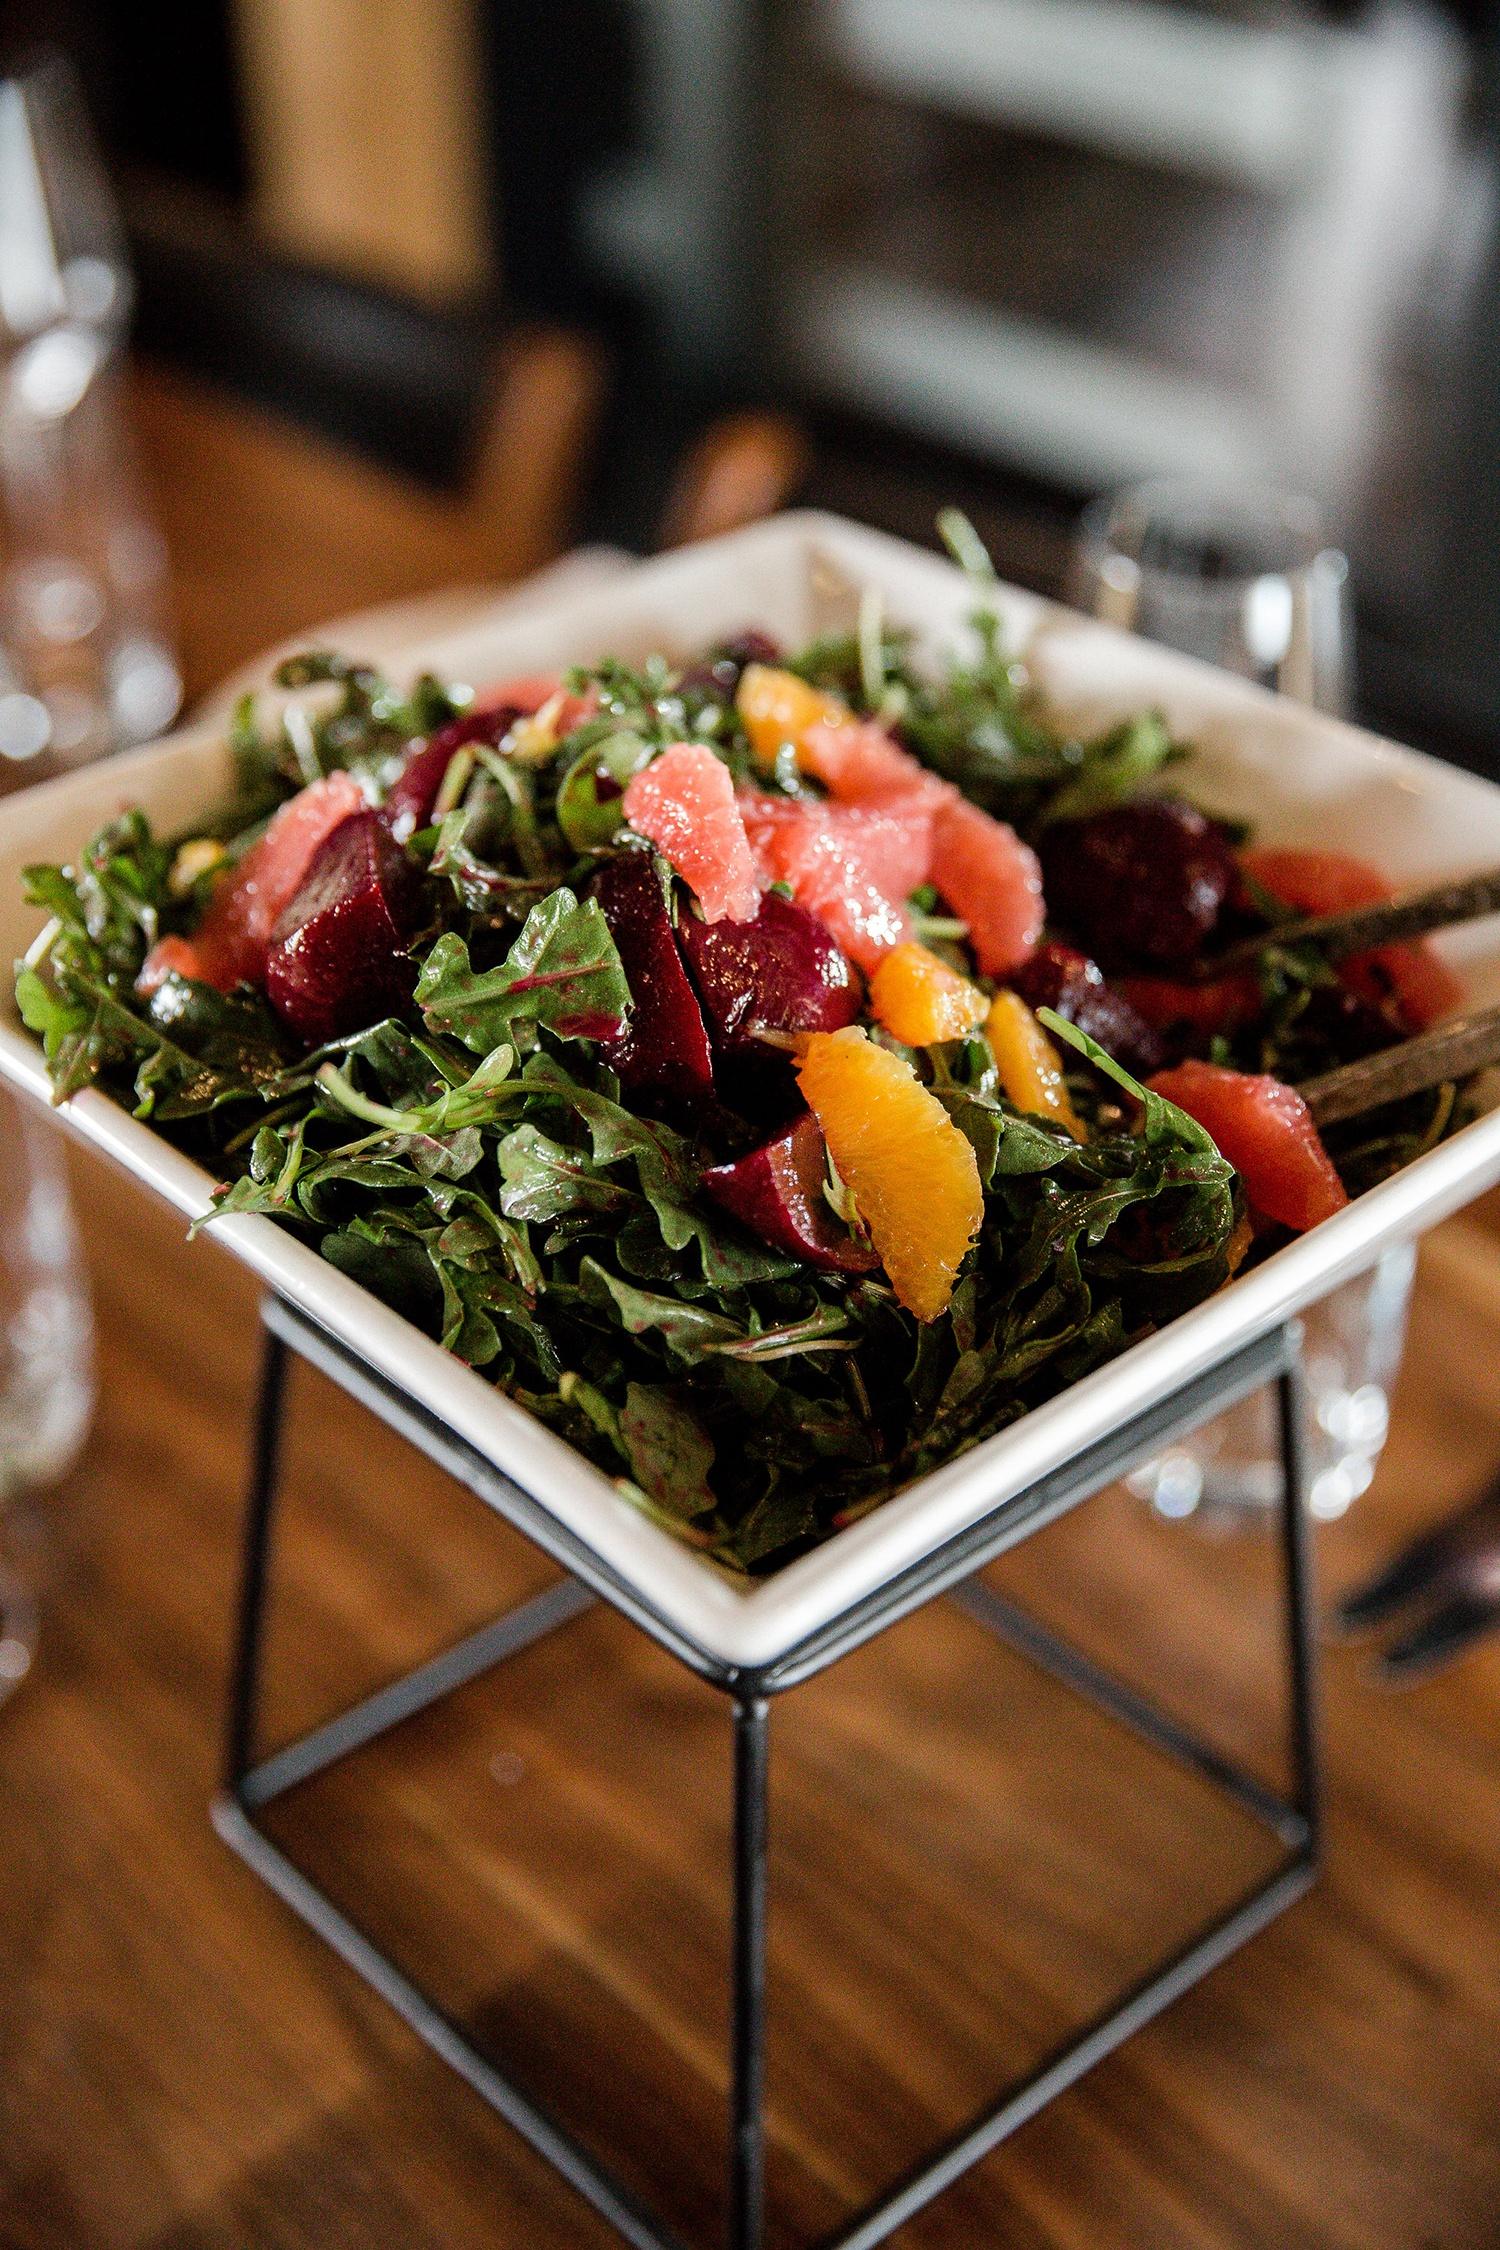 Gallery-Pickled-Beet-_-Arugula-Salad2.jpg